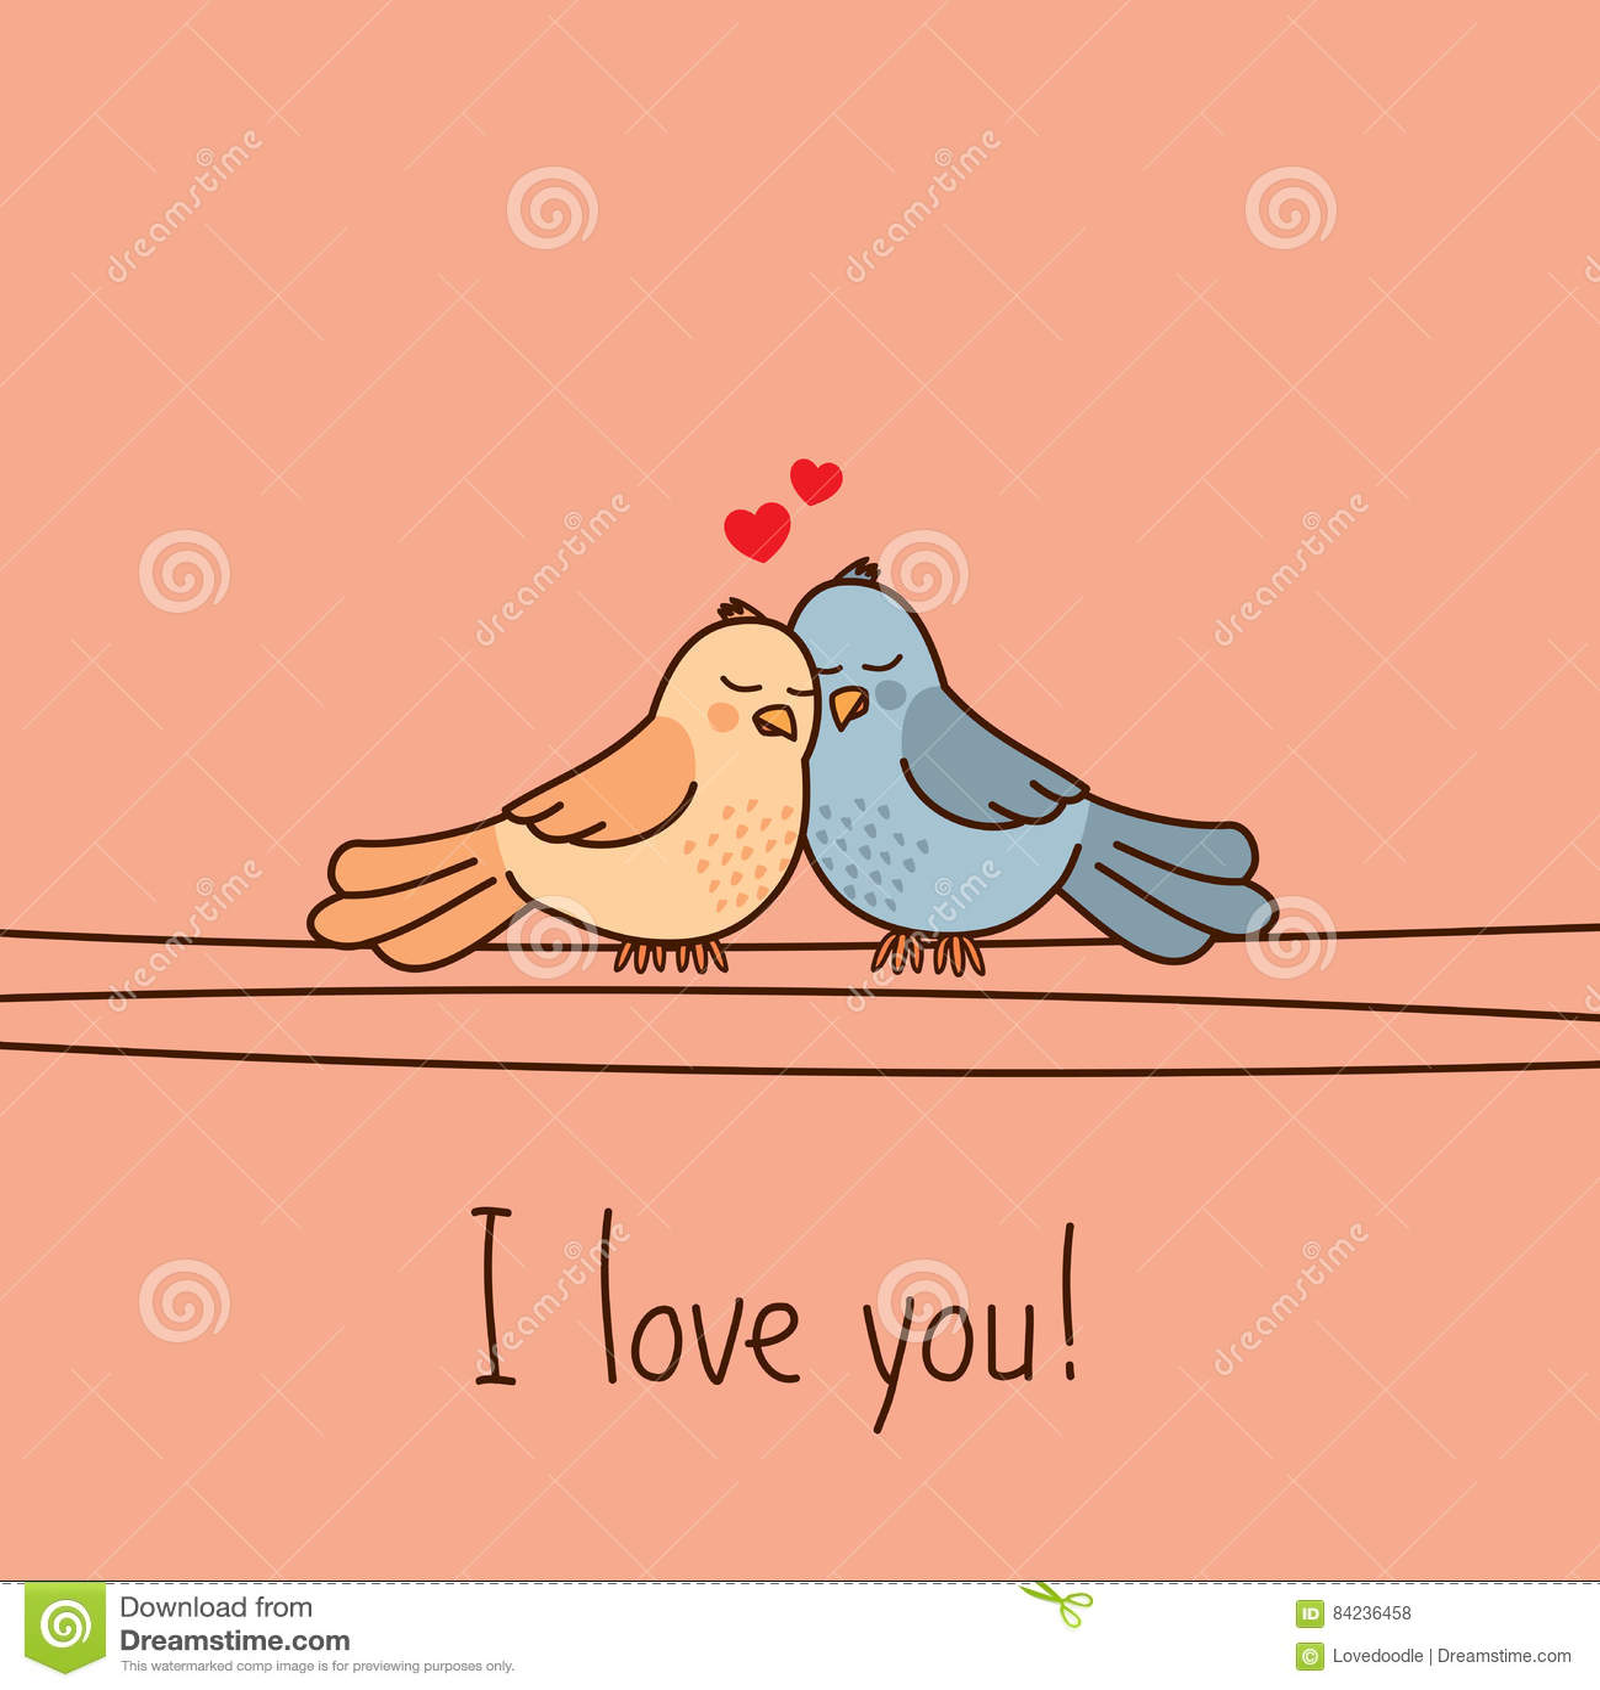 Valentines Day Greeting Card With Two Cute Cartoon Love Birds – Bird Valentine Card